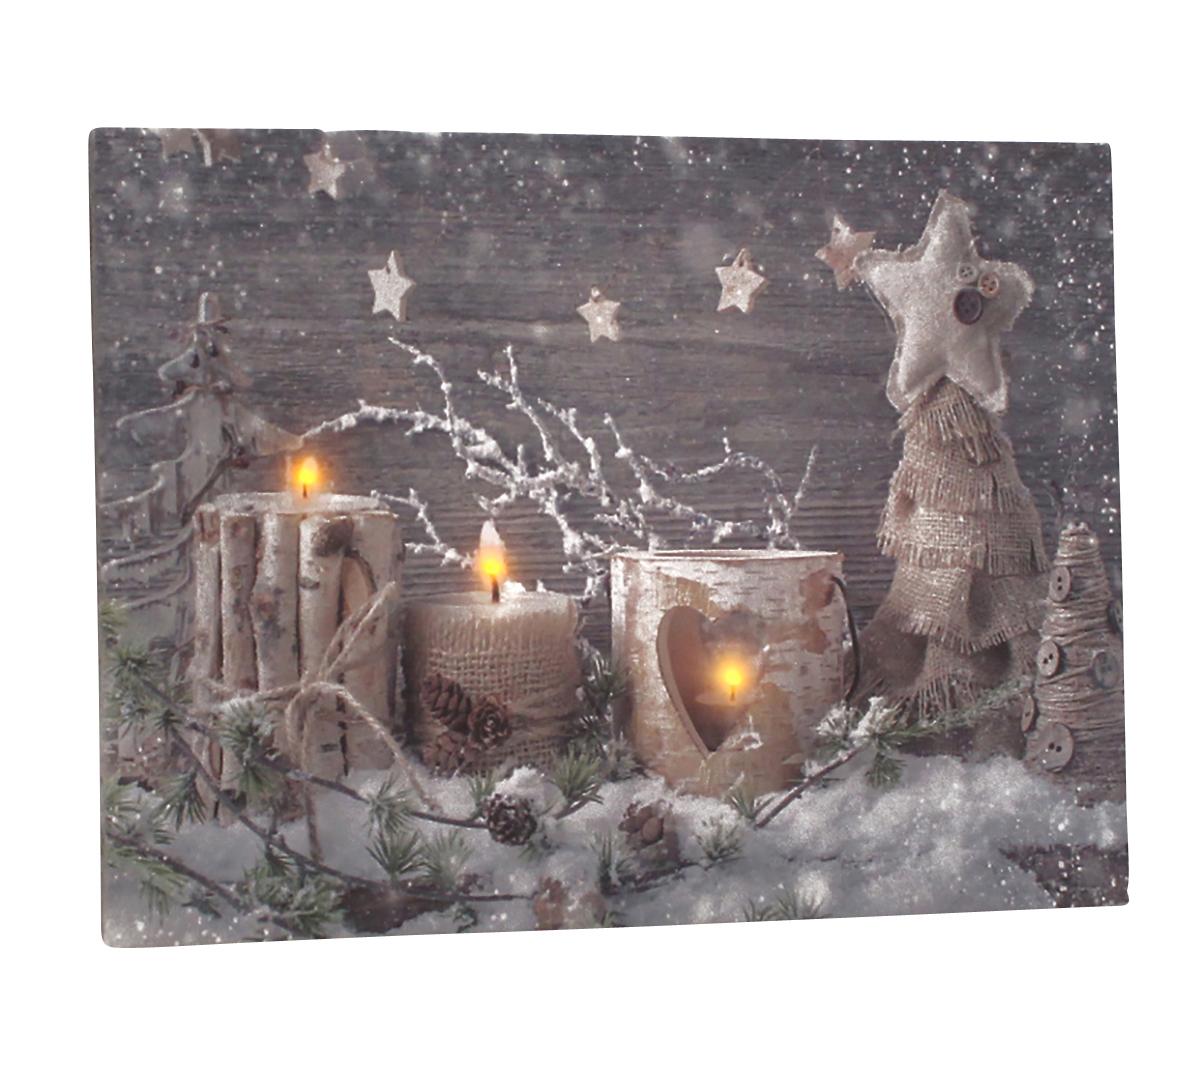 Leinwandbild Mit Led Beleuchtung 30 X 40 Cm Wandbild Mit Kerzen Und